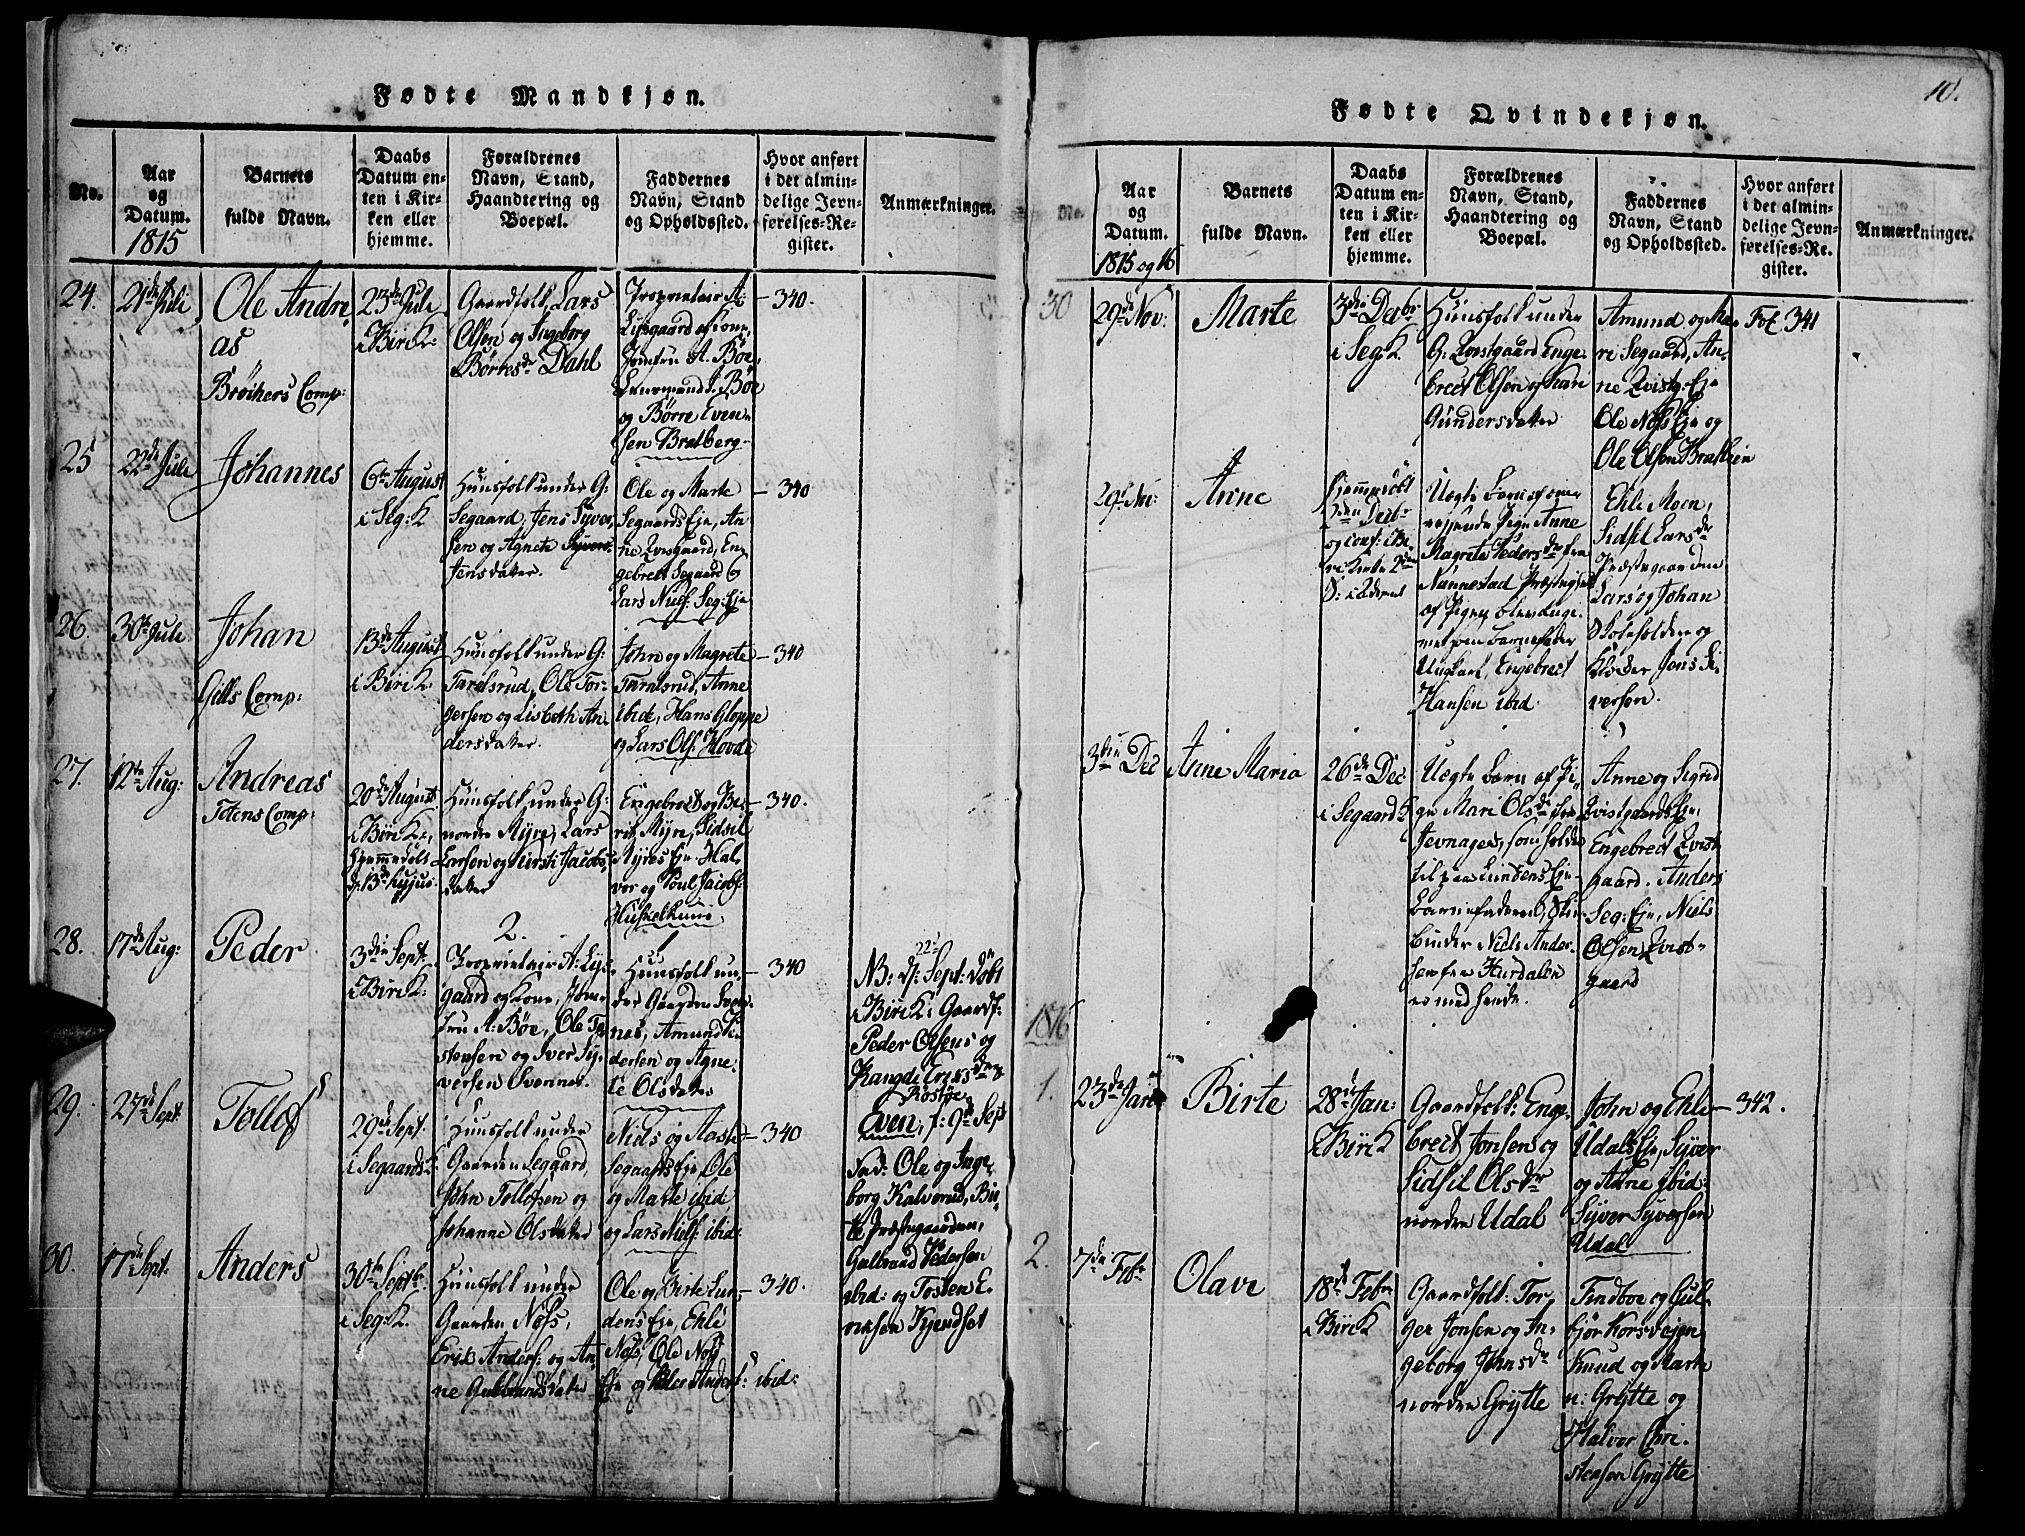 SAH, Biri prestekontor, Ministerialbok nr. 3, 1814-1828, s. 10